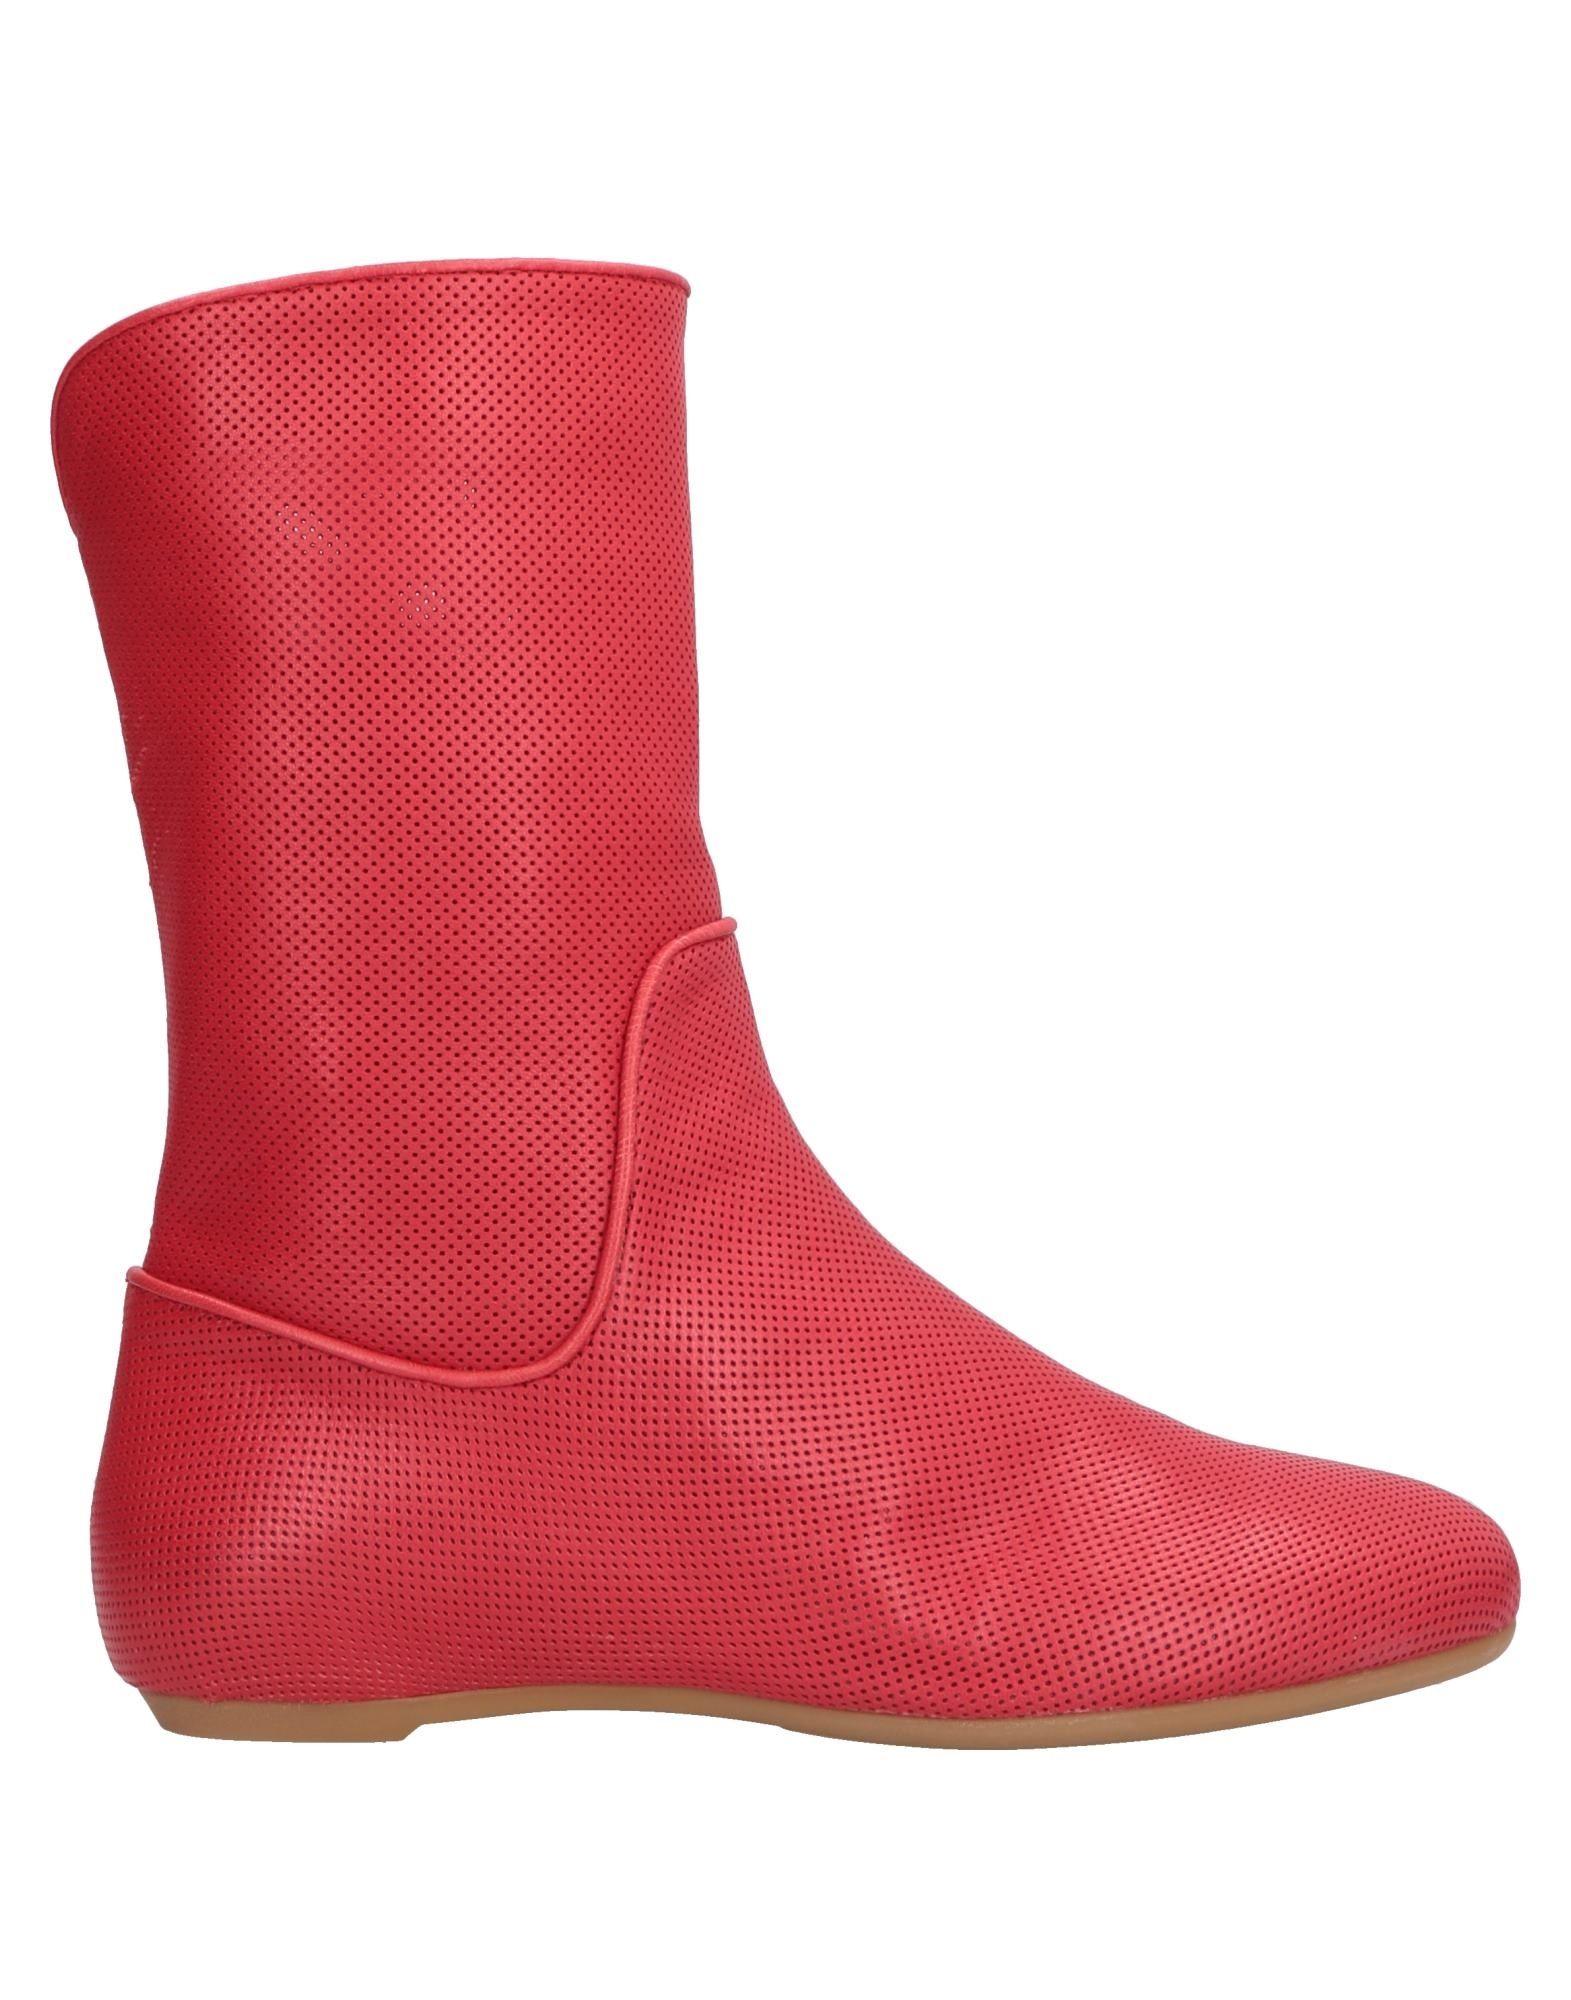 Rabatt  Schuhe Loriblu Stiefelette Damen  Rabatt 11560525AX 35f699